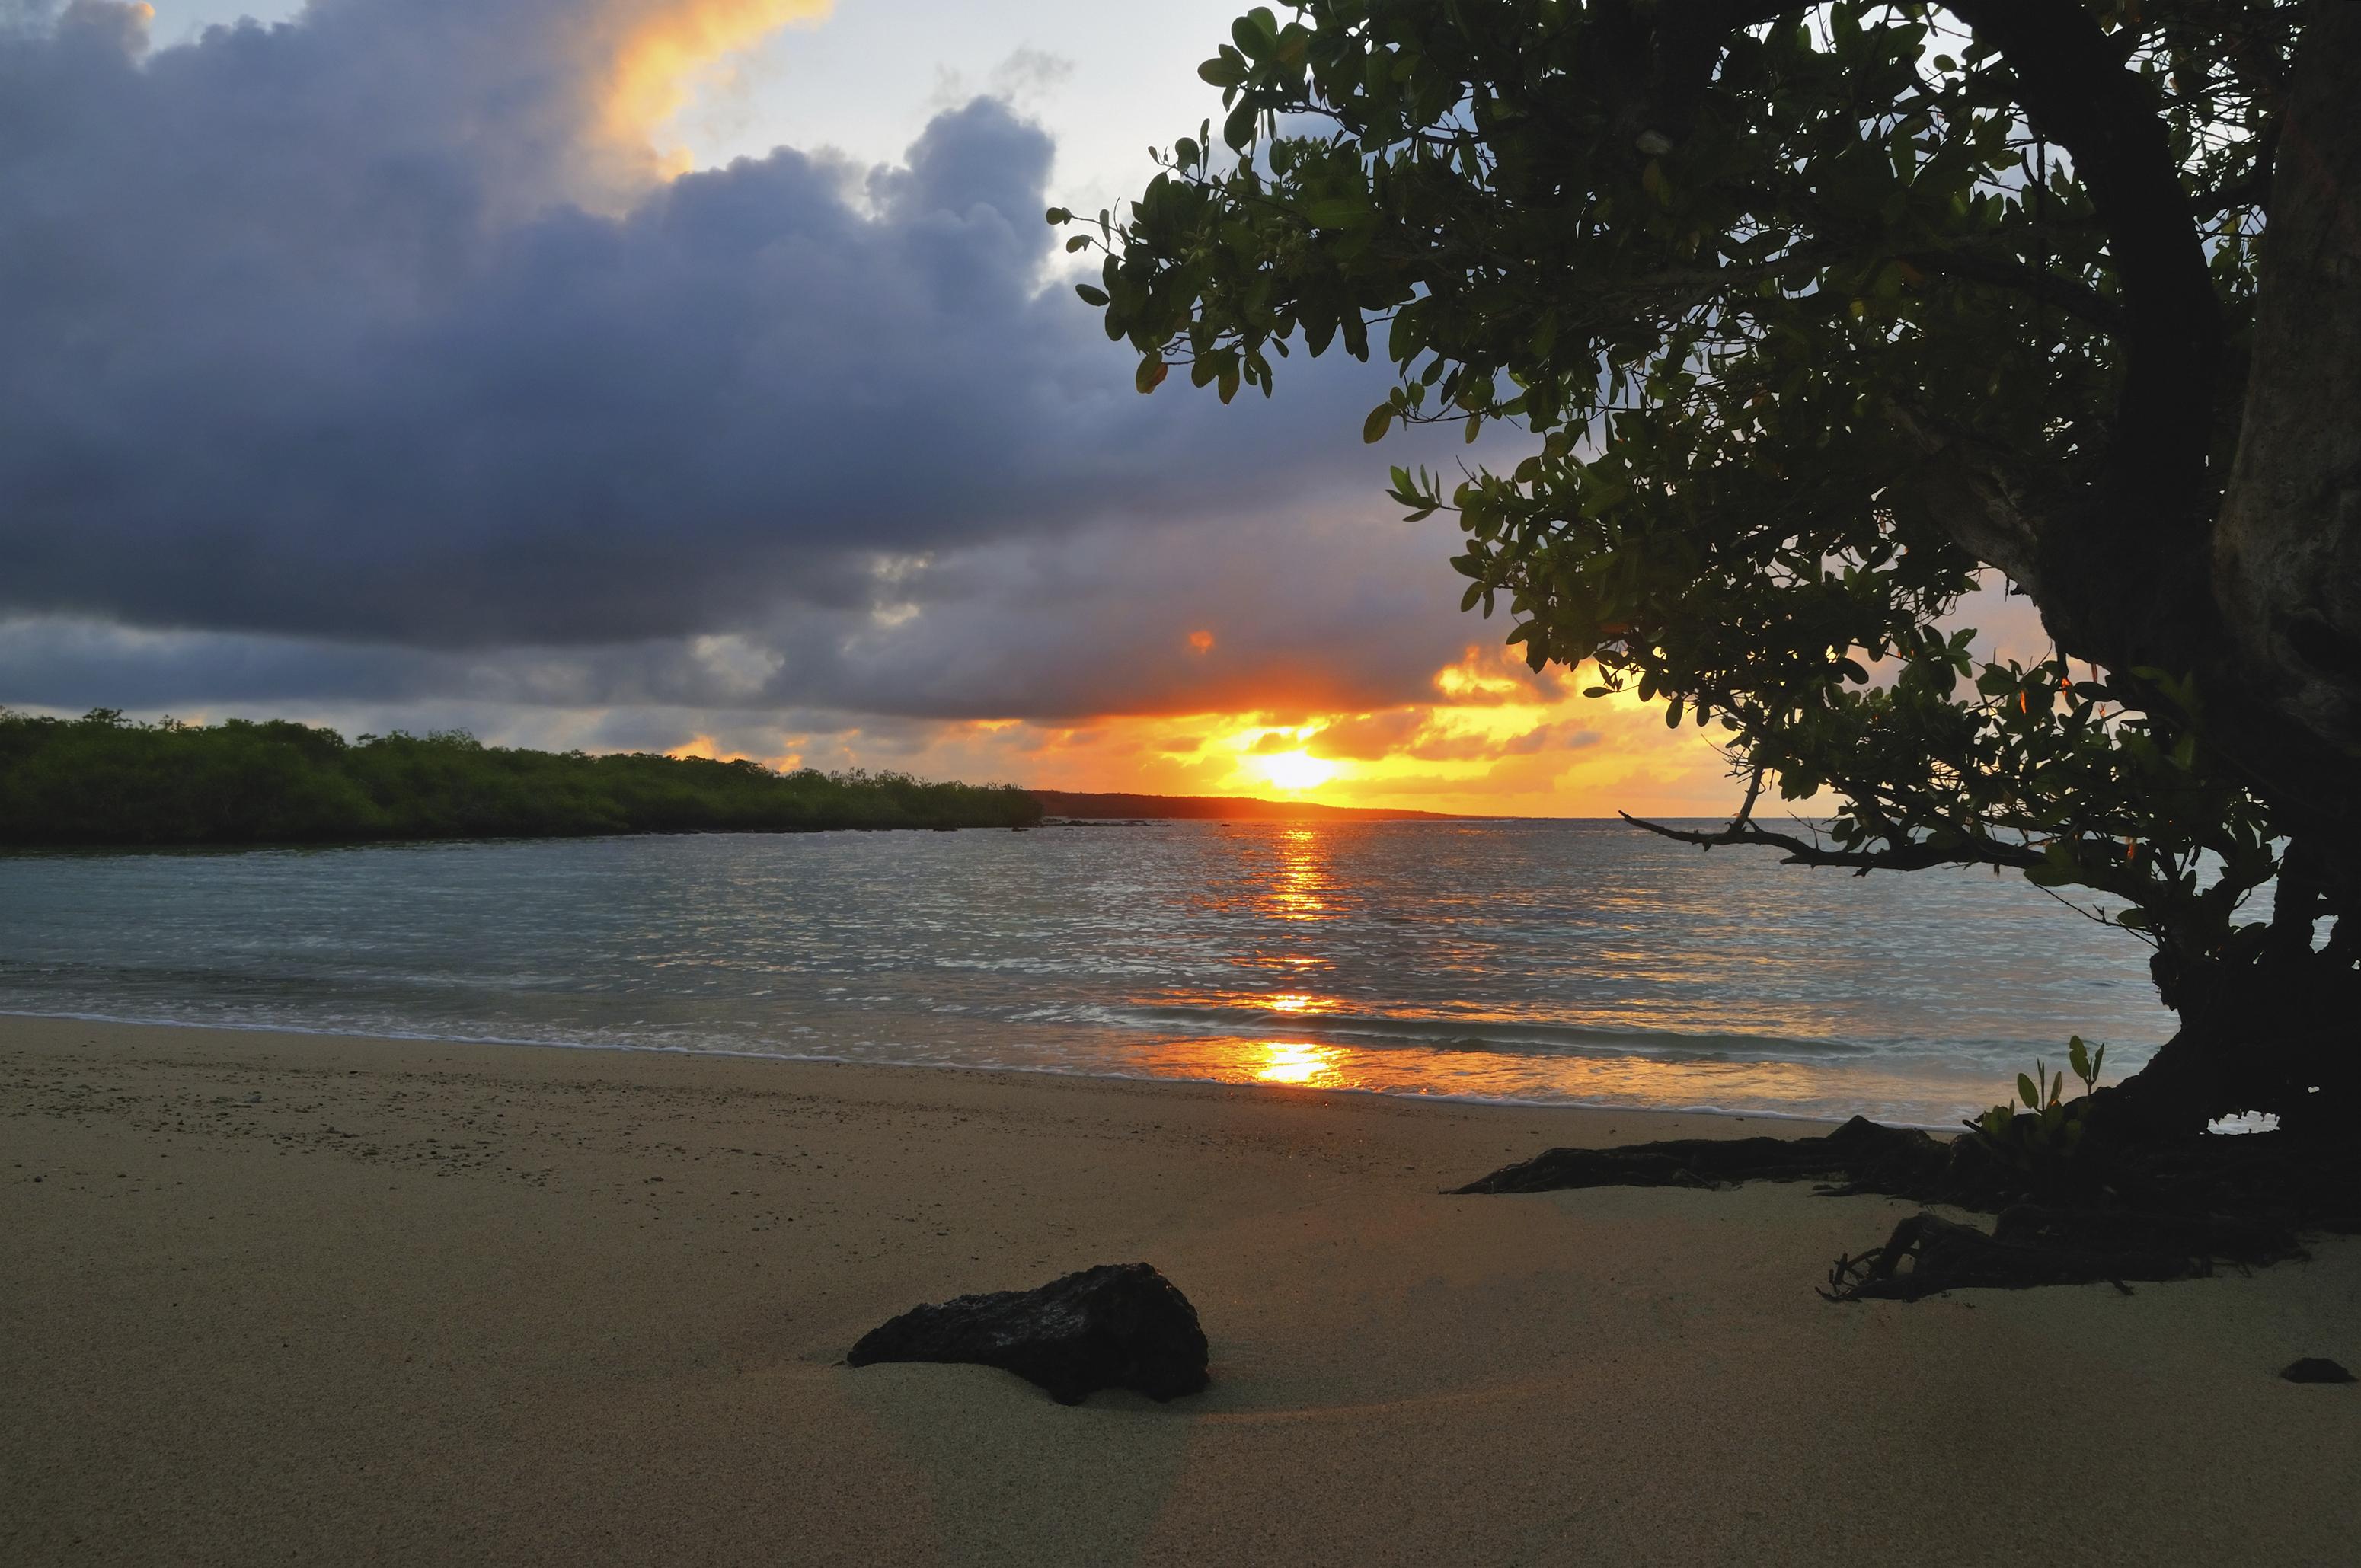 Sunrise in the Galapagos, Ecuador